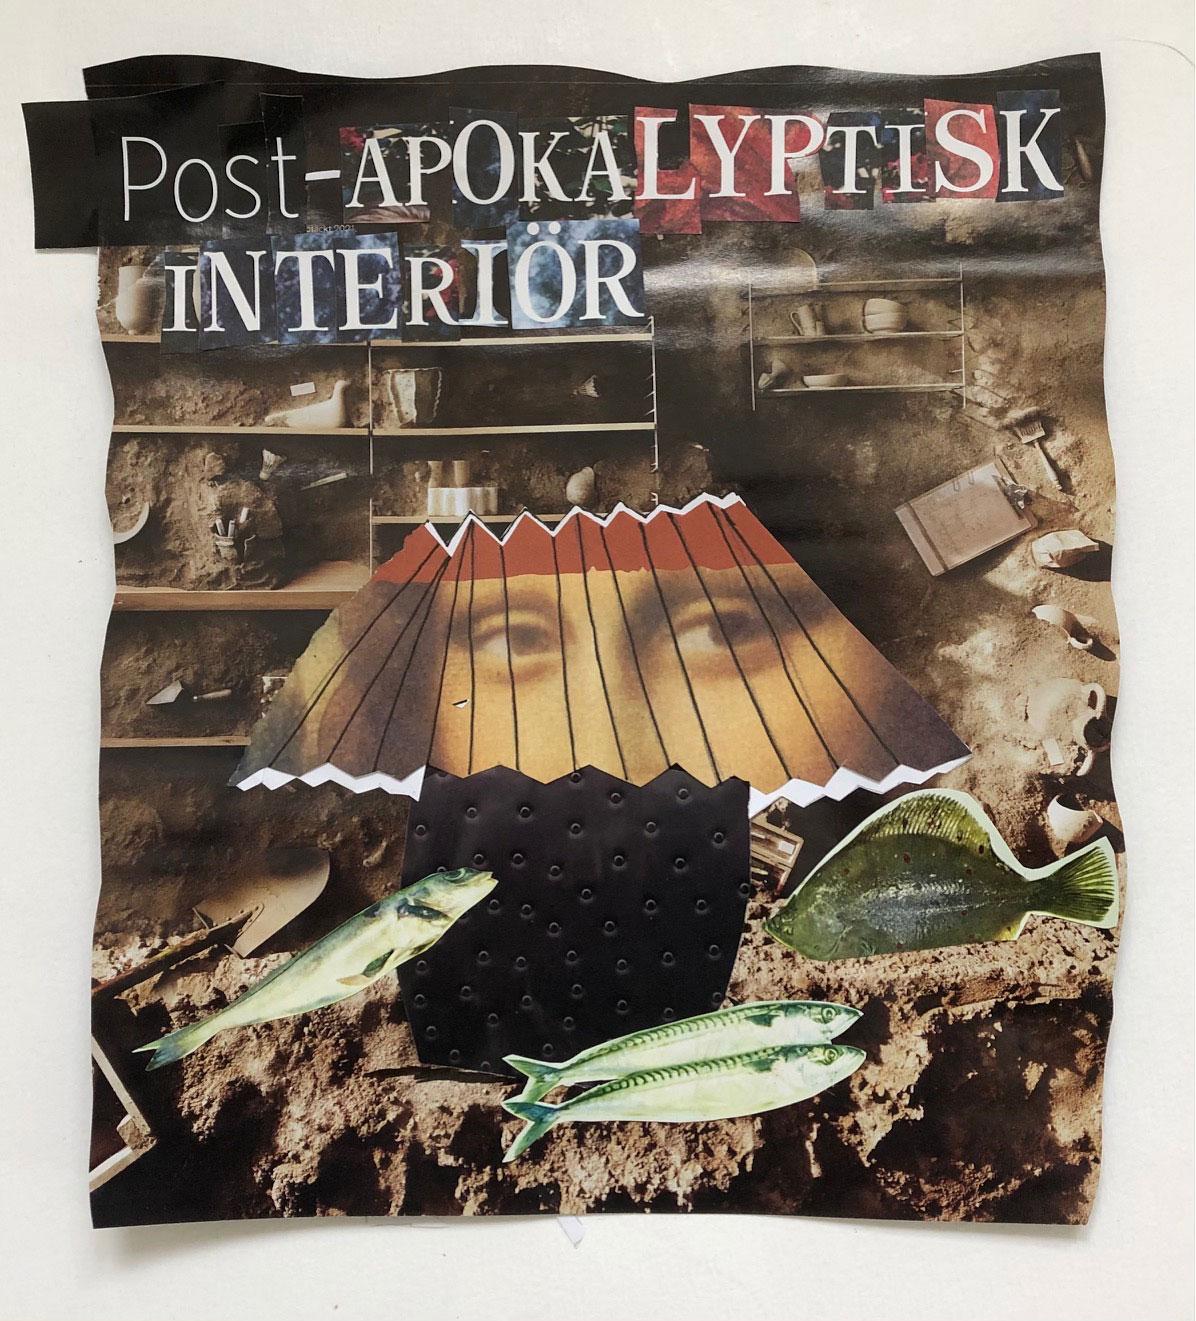 Post-apokalyptisk interiör - Eva Wastenson 2021